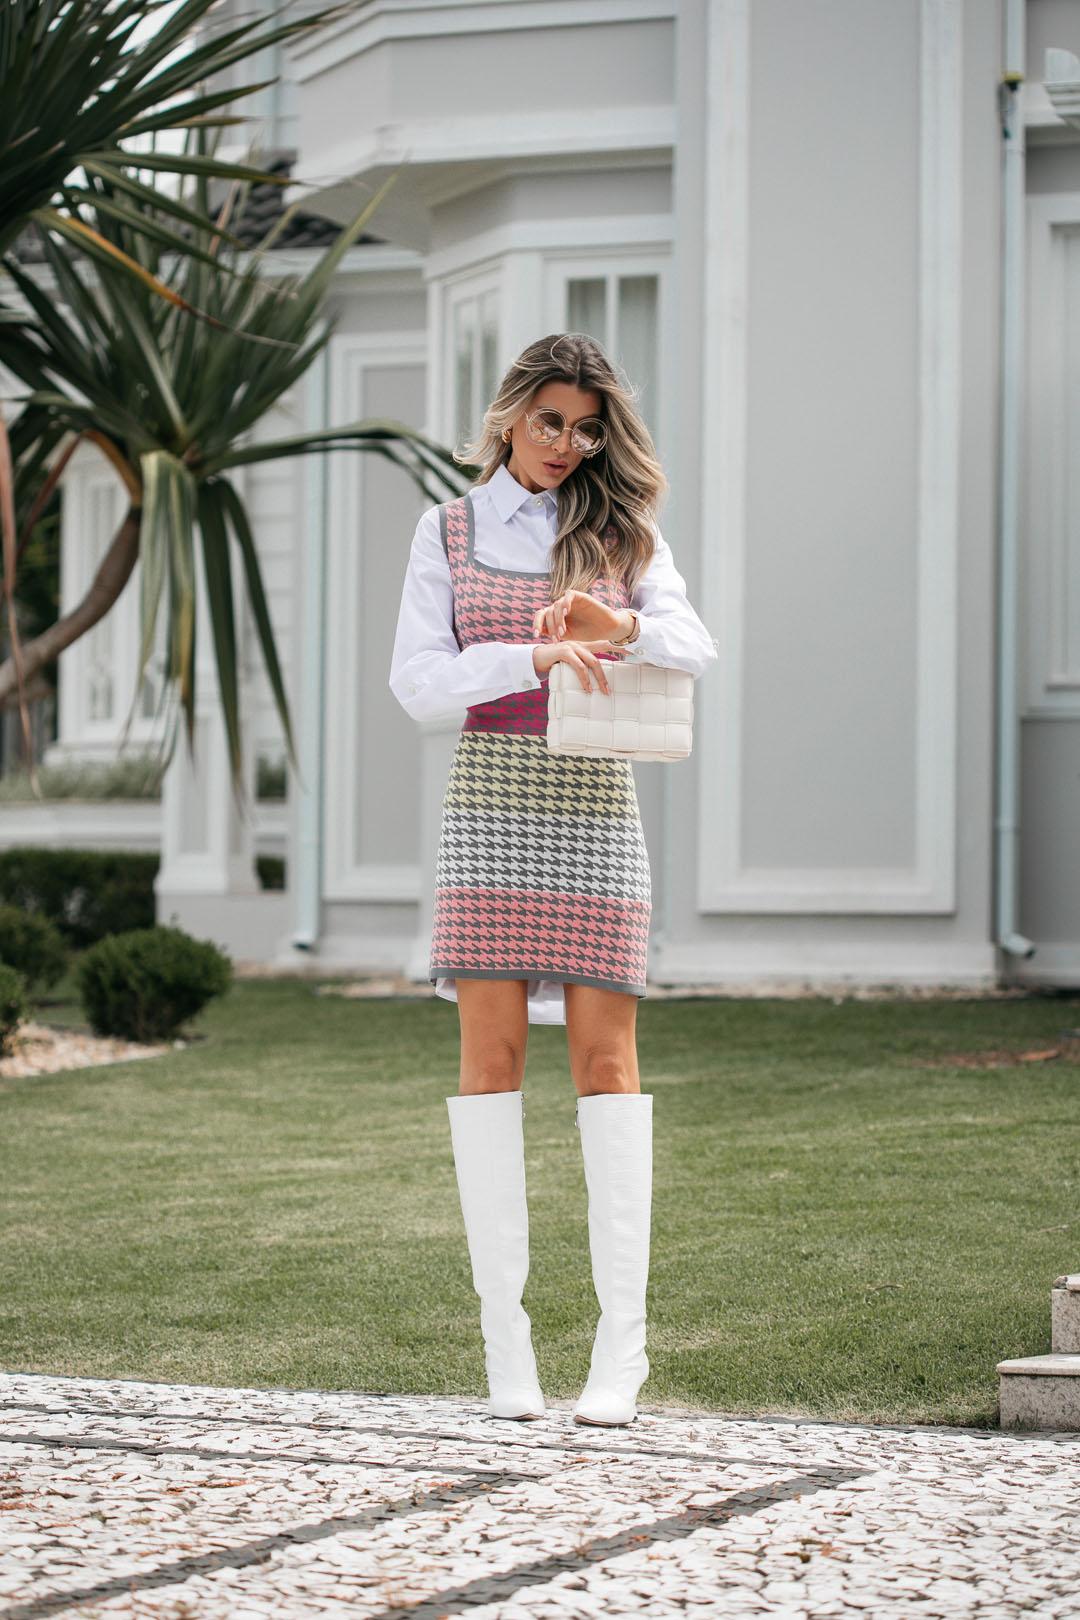 Vestido Penélope  Feminino Vera Tricot Pied Poule Cinza / Rosa / Amarelo / Pink